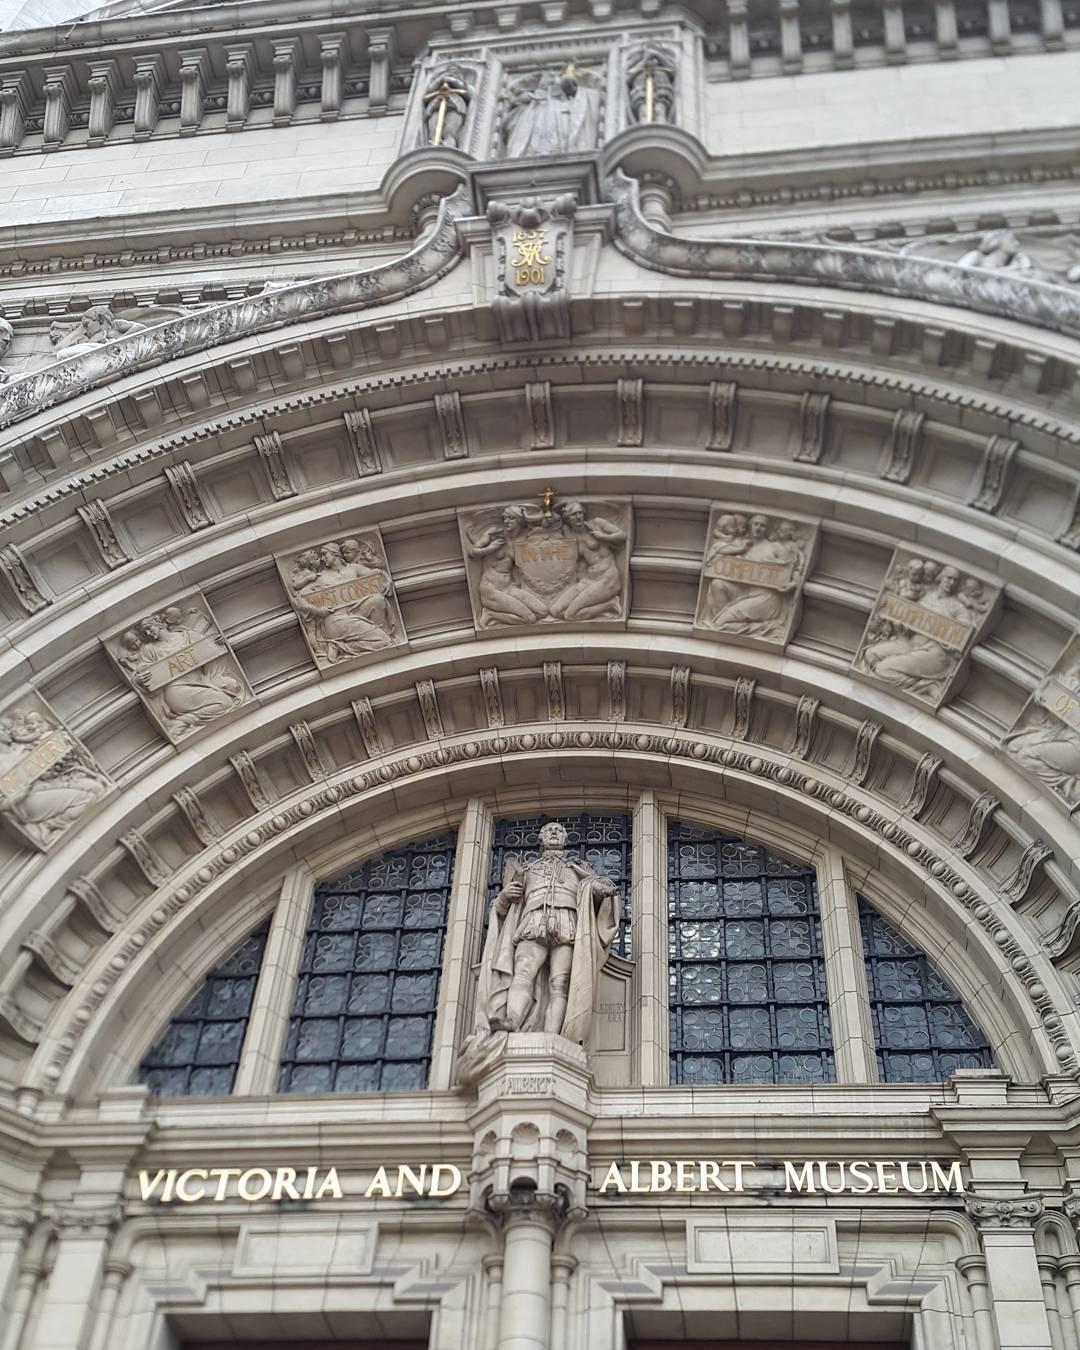 Khat Diwani Ajhalawani/Amr أستعرض معكم في الصور القادمة بعض مقتنيات العصر الإسلامي الذي يخص #متحف_فيكتوريا_… 36